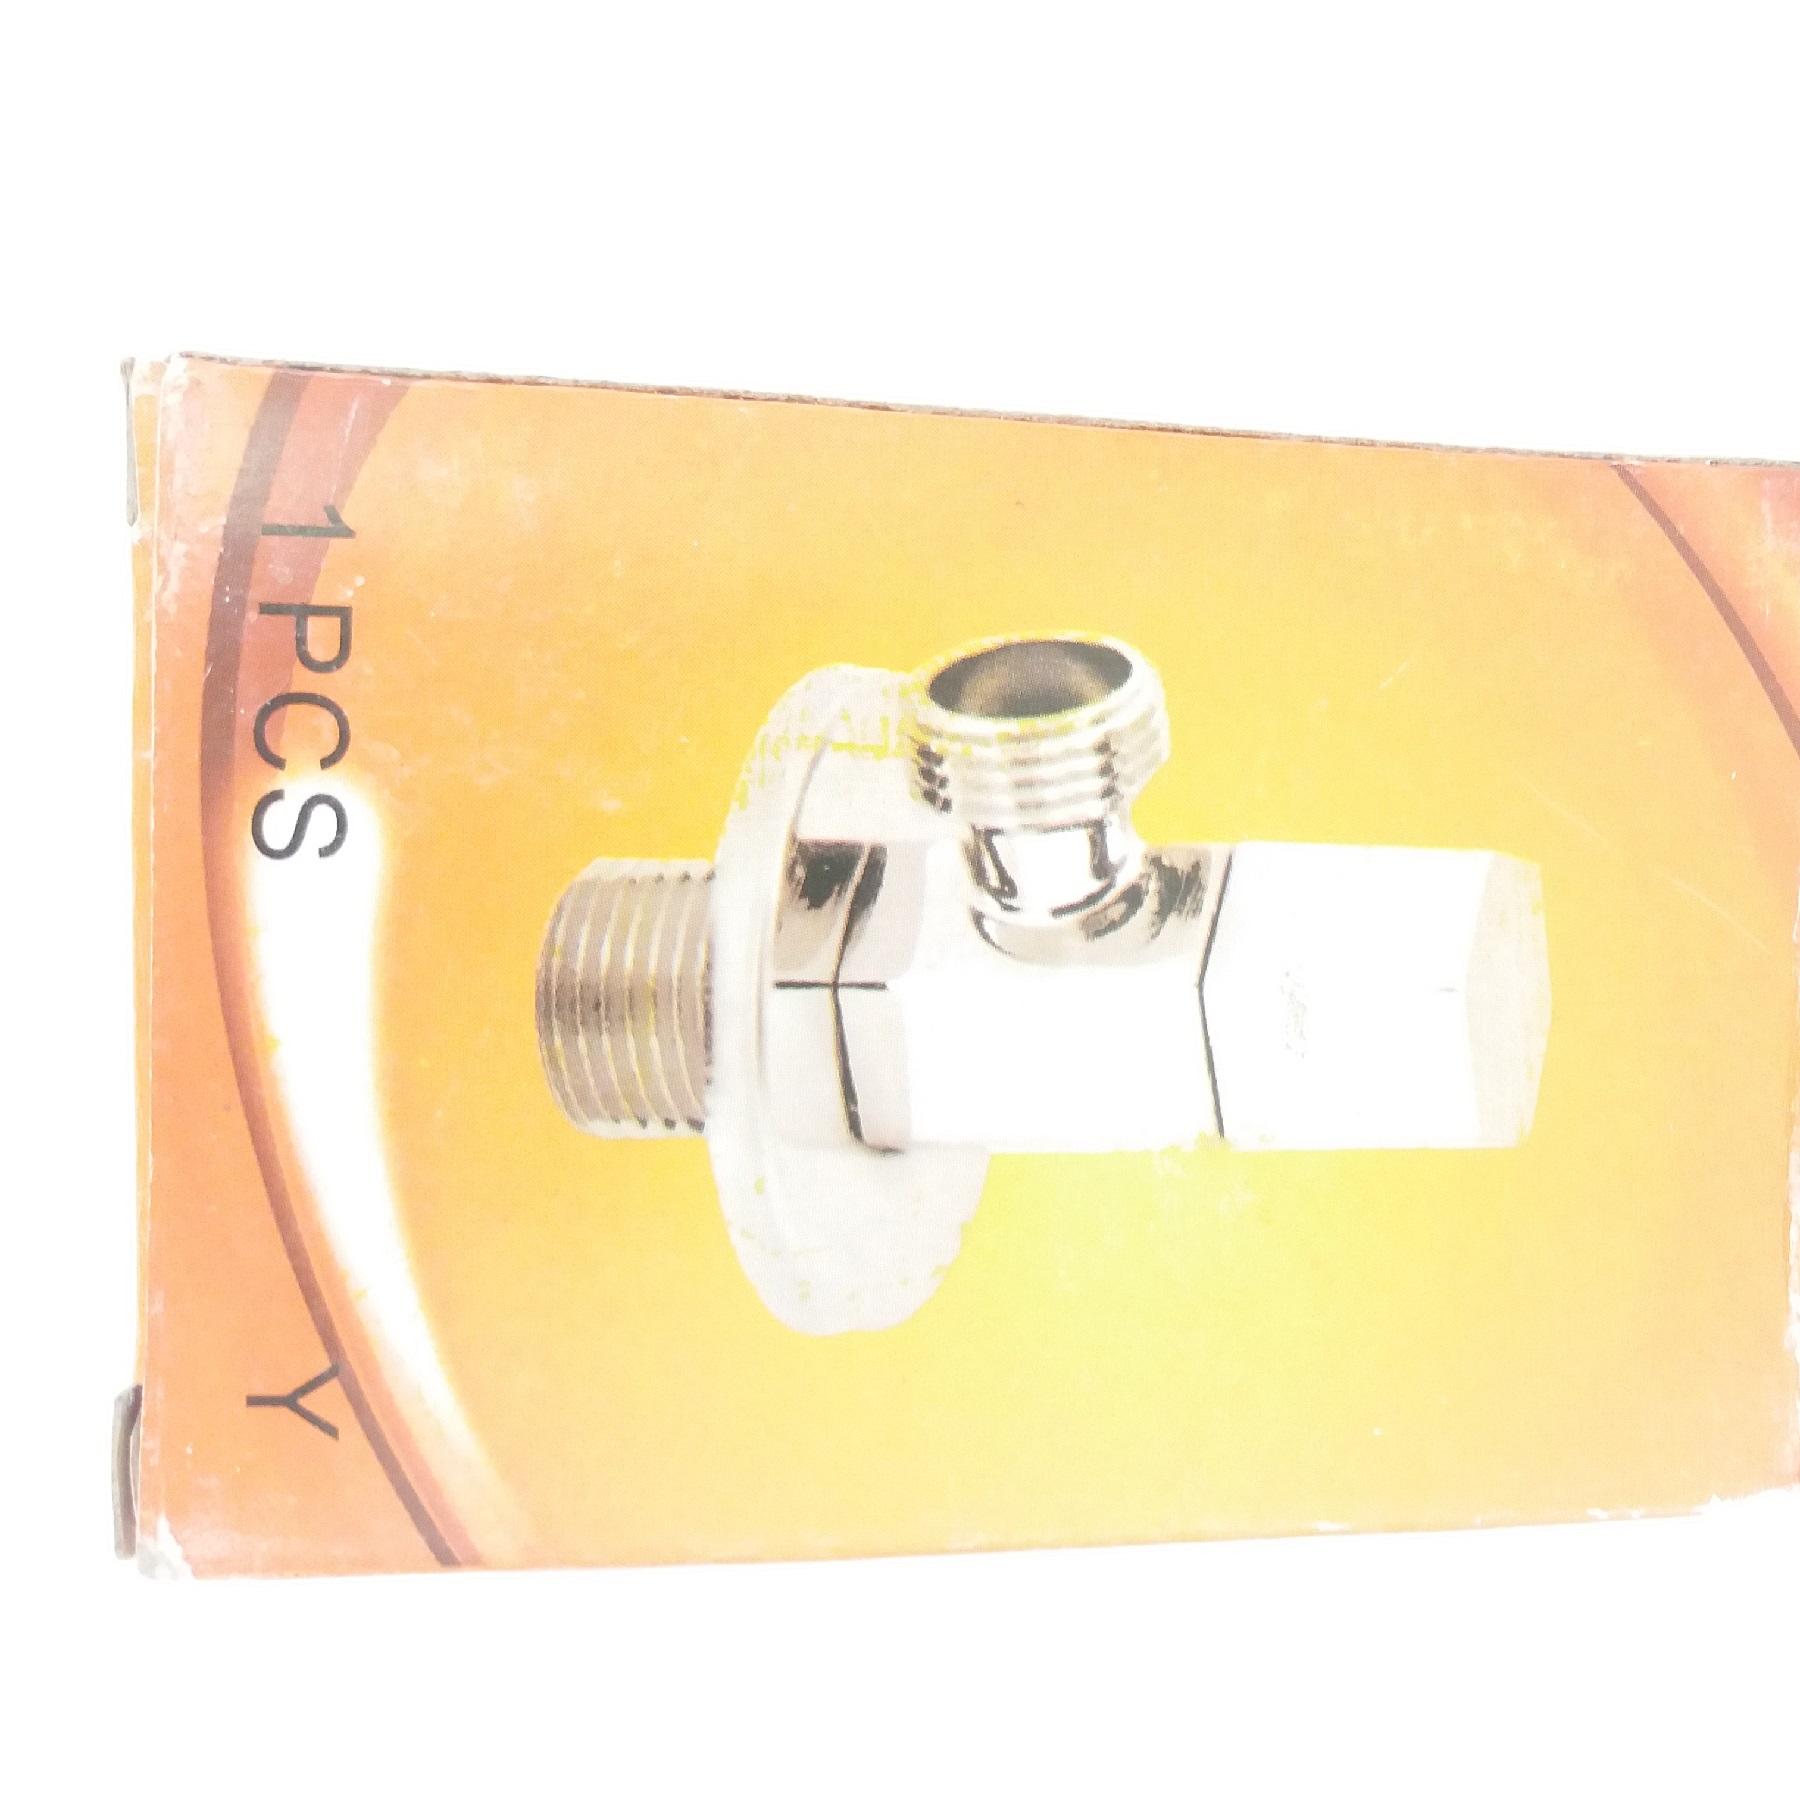 قیمت                                       شیر پیسوار سیتکو مدل 12/12